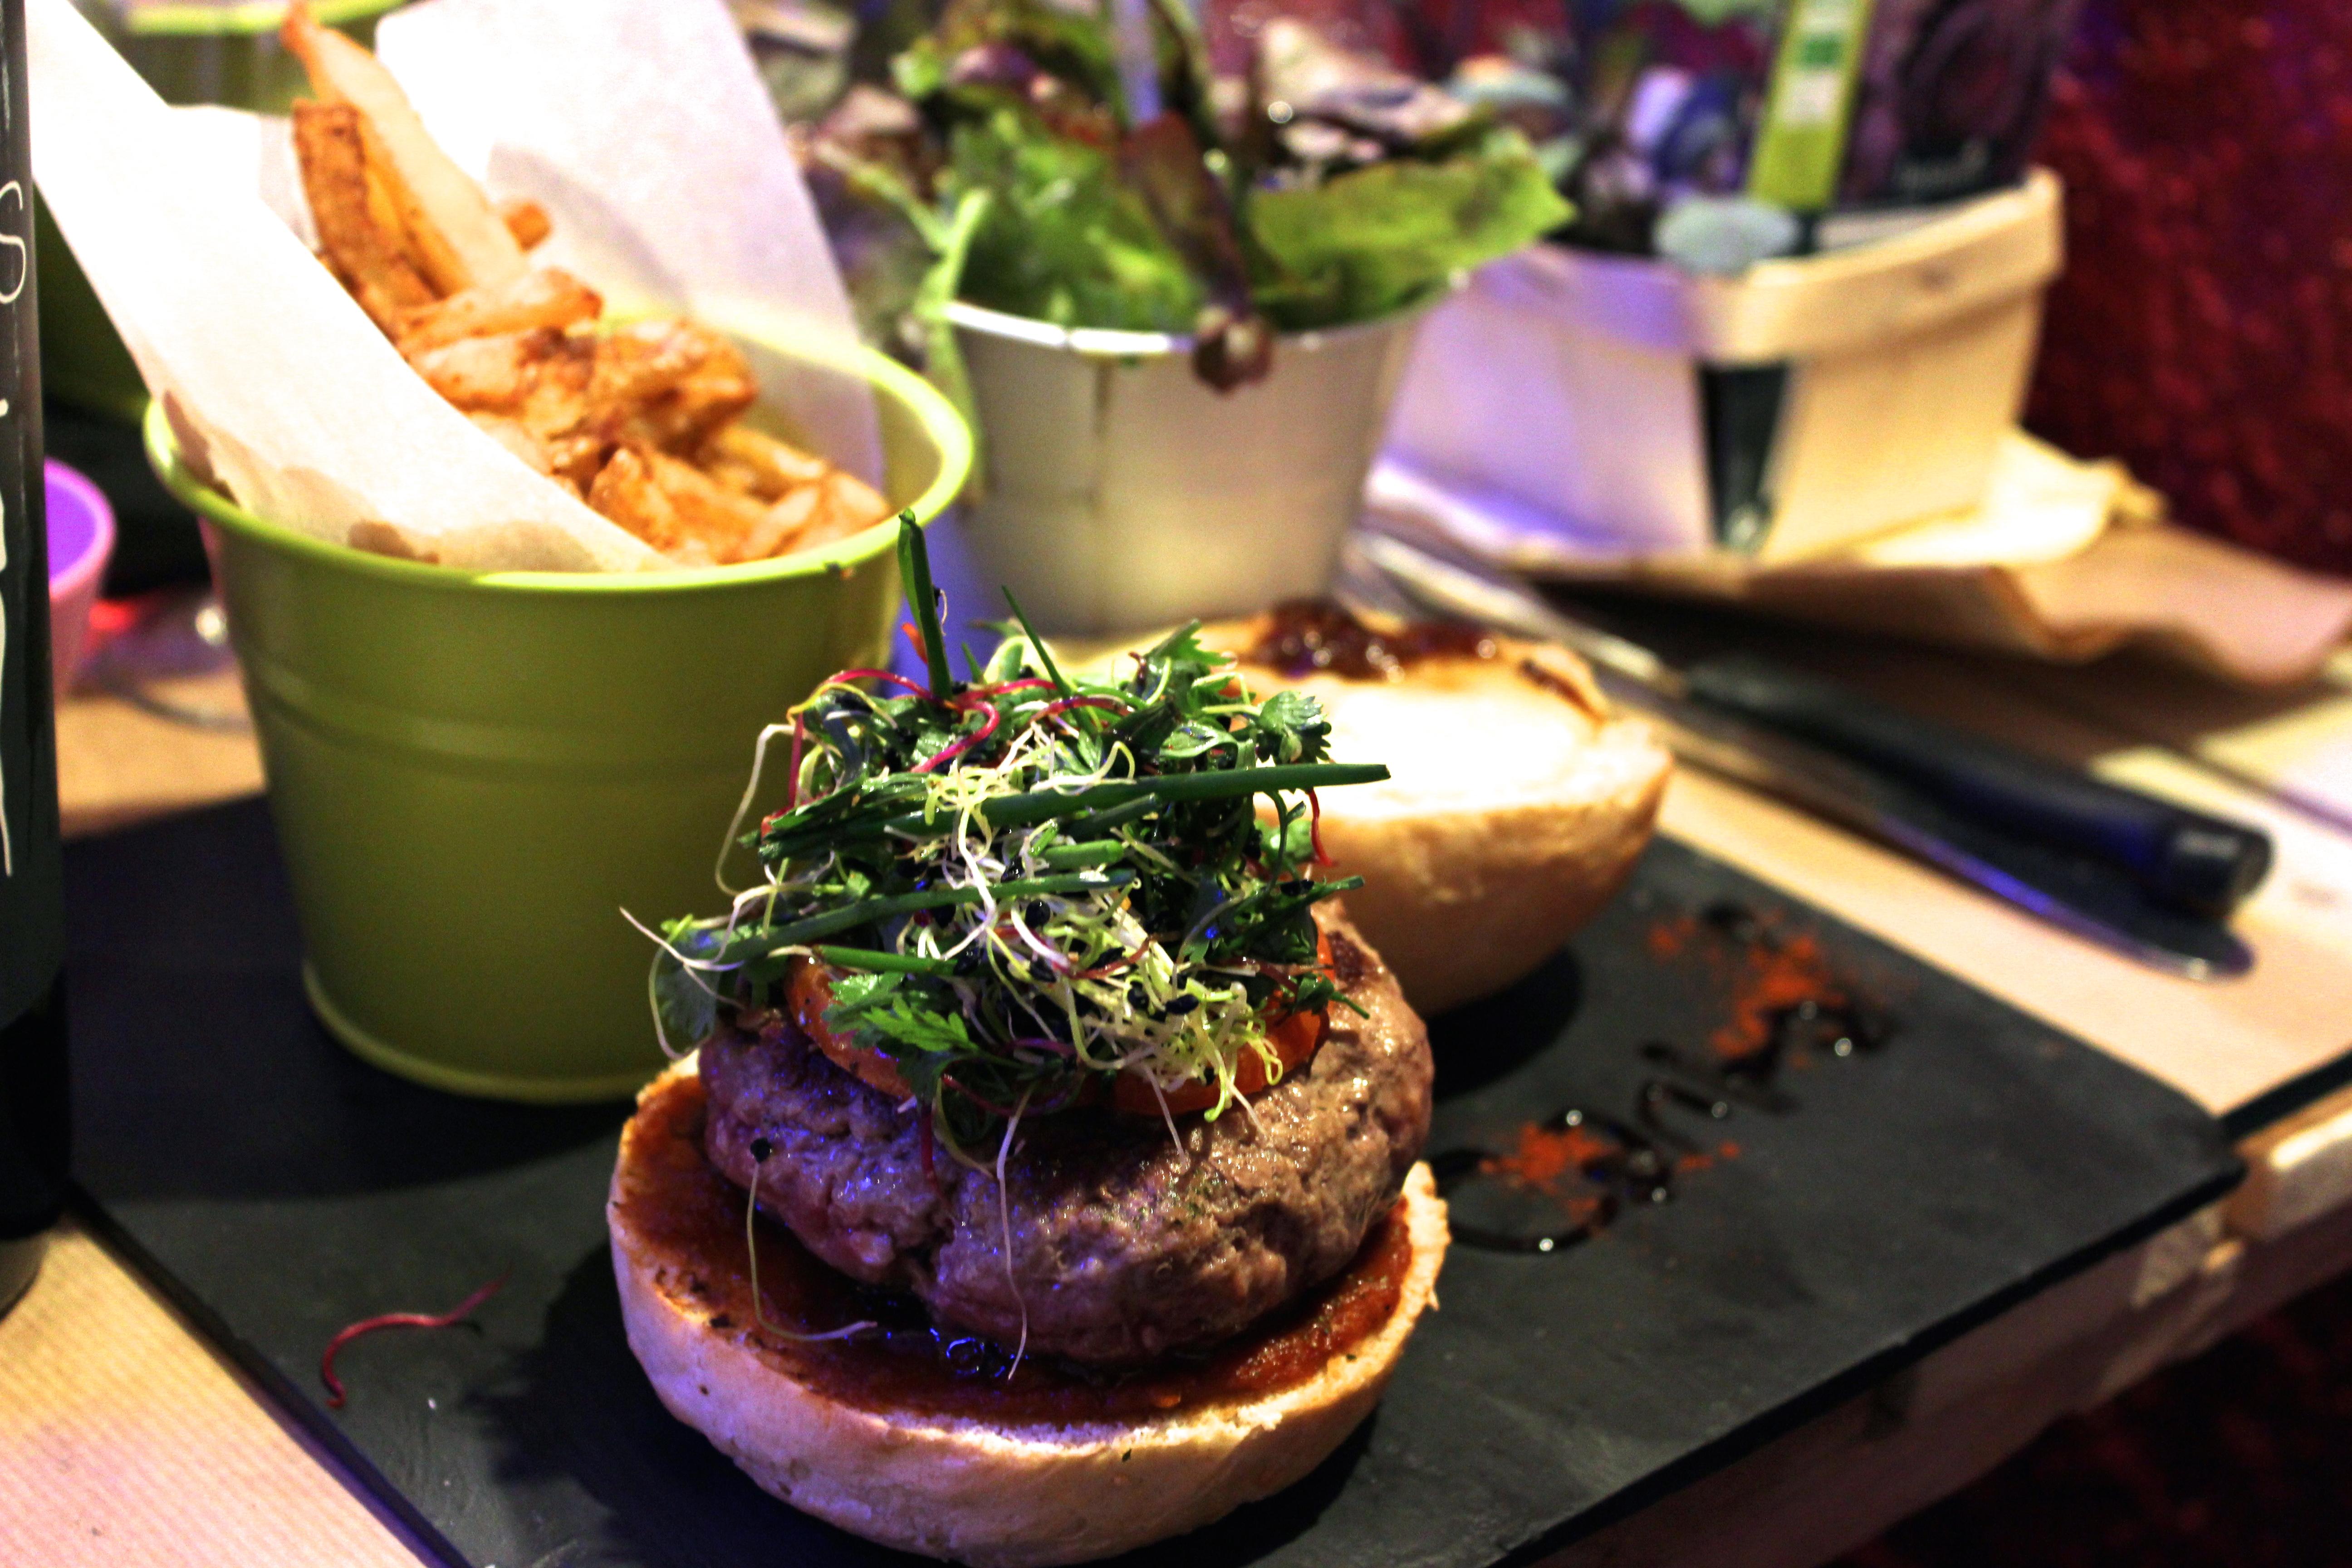 Le bourgeon burger bio montpellier tribulations d 39 ana s - Vide dressing montpellier ...